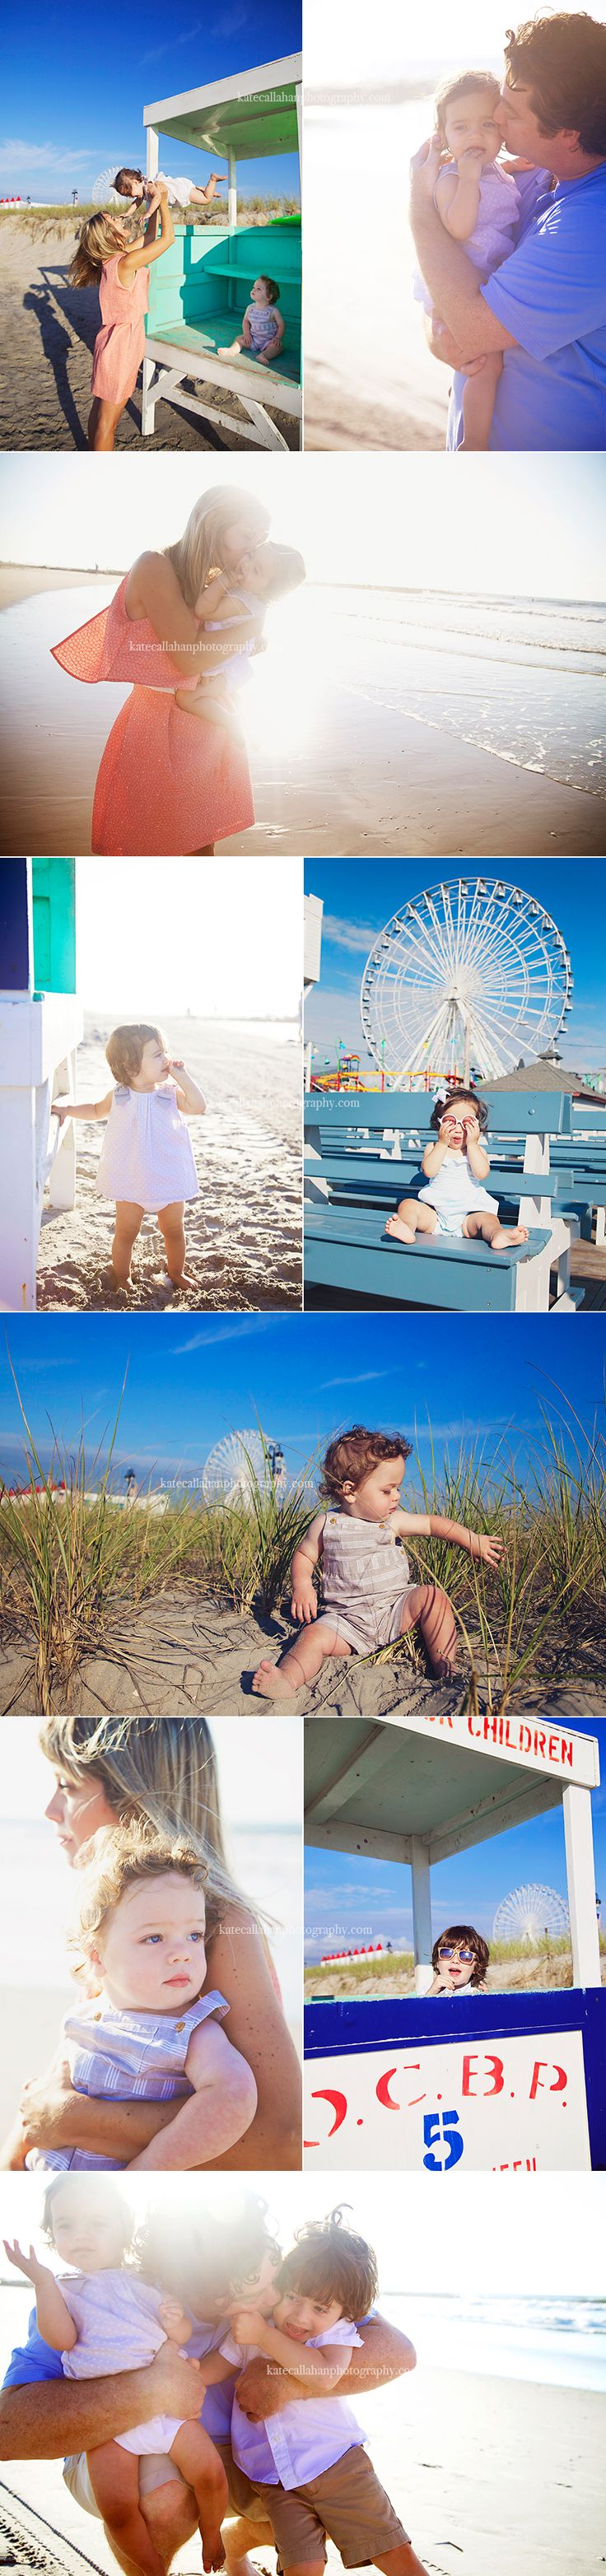 Babies on the beach! SOOOOOO much cuteness!!!!!!! — Ocean City, NJ family photographer | Hudson Valley, NY child, family, newborn, senior photographer -- Kate Callahan Photography -- also serving, NYC, DE, MD, NJ, PA